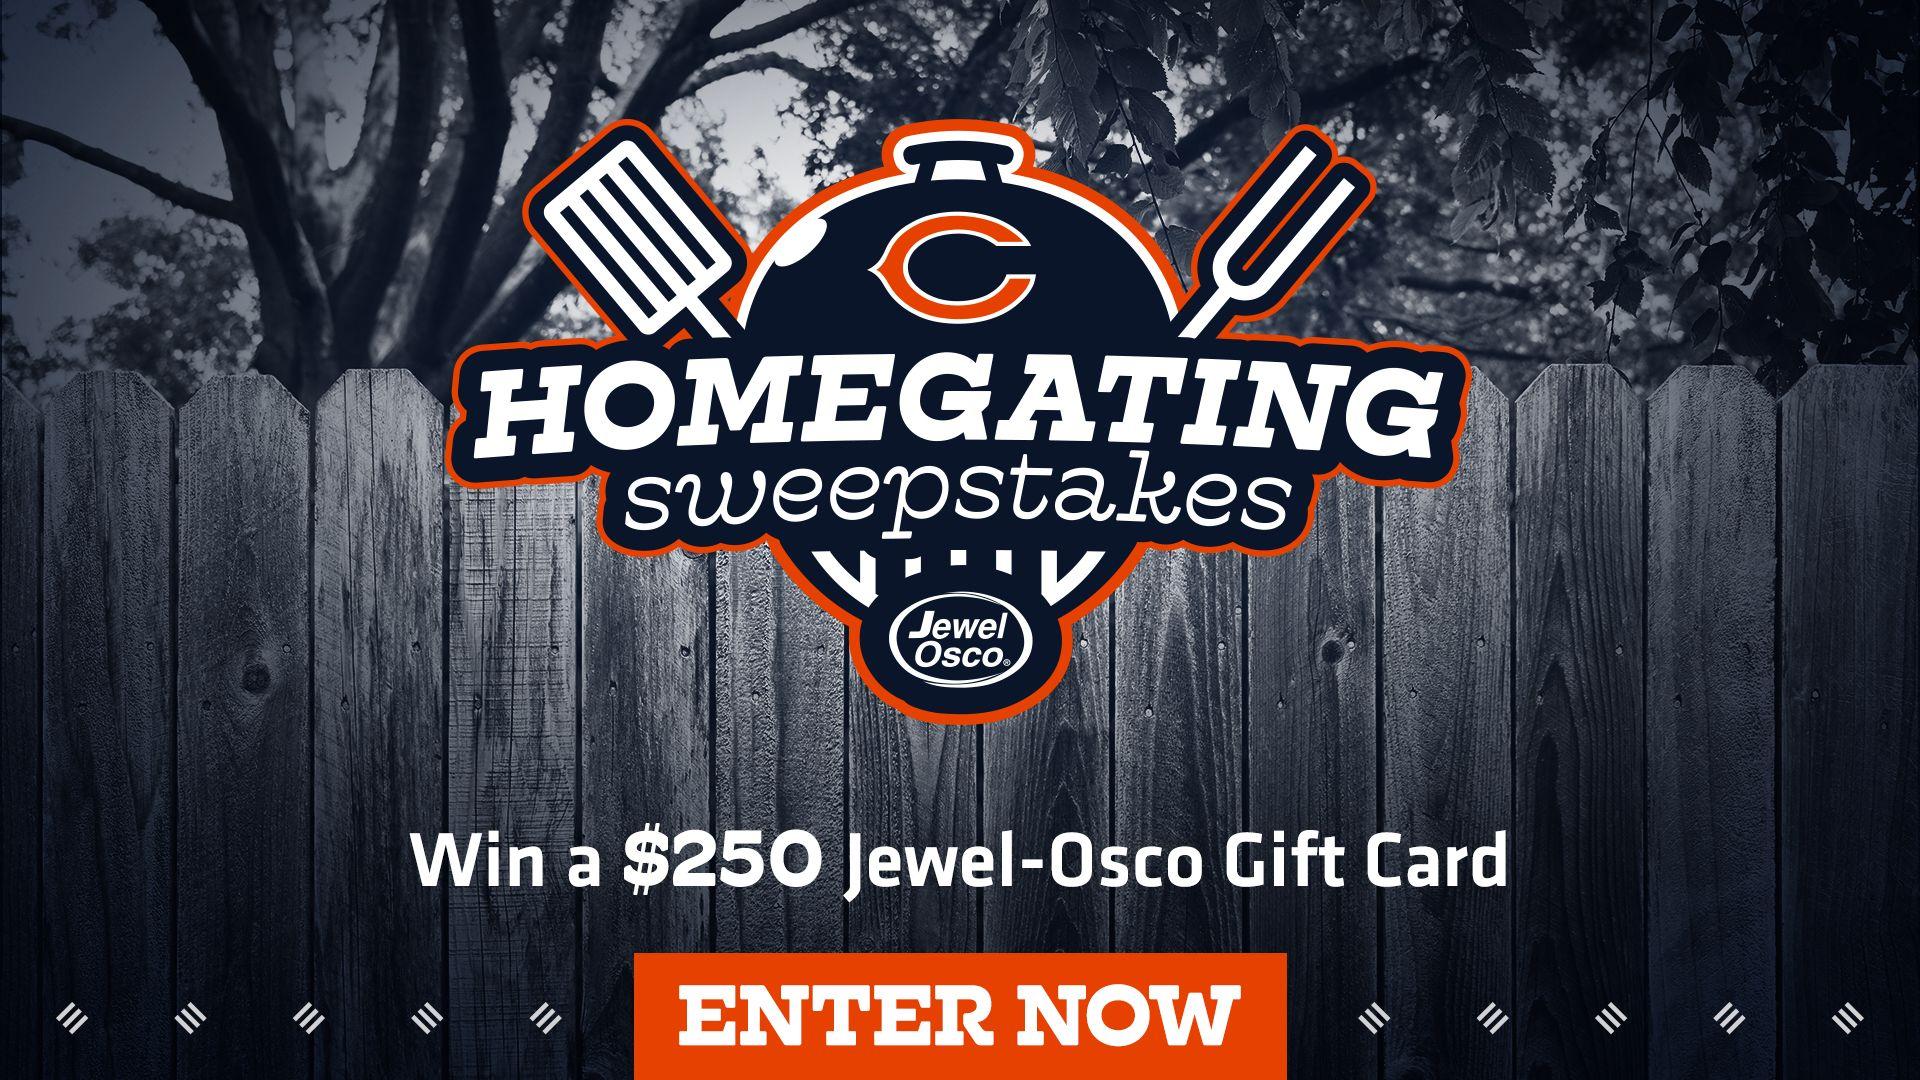 Win a $250 Jewel-Osco Gift Card